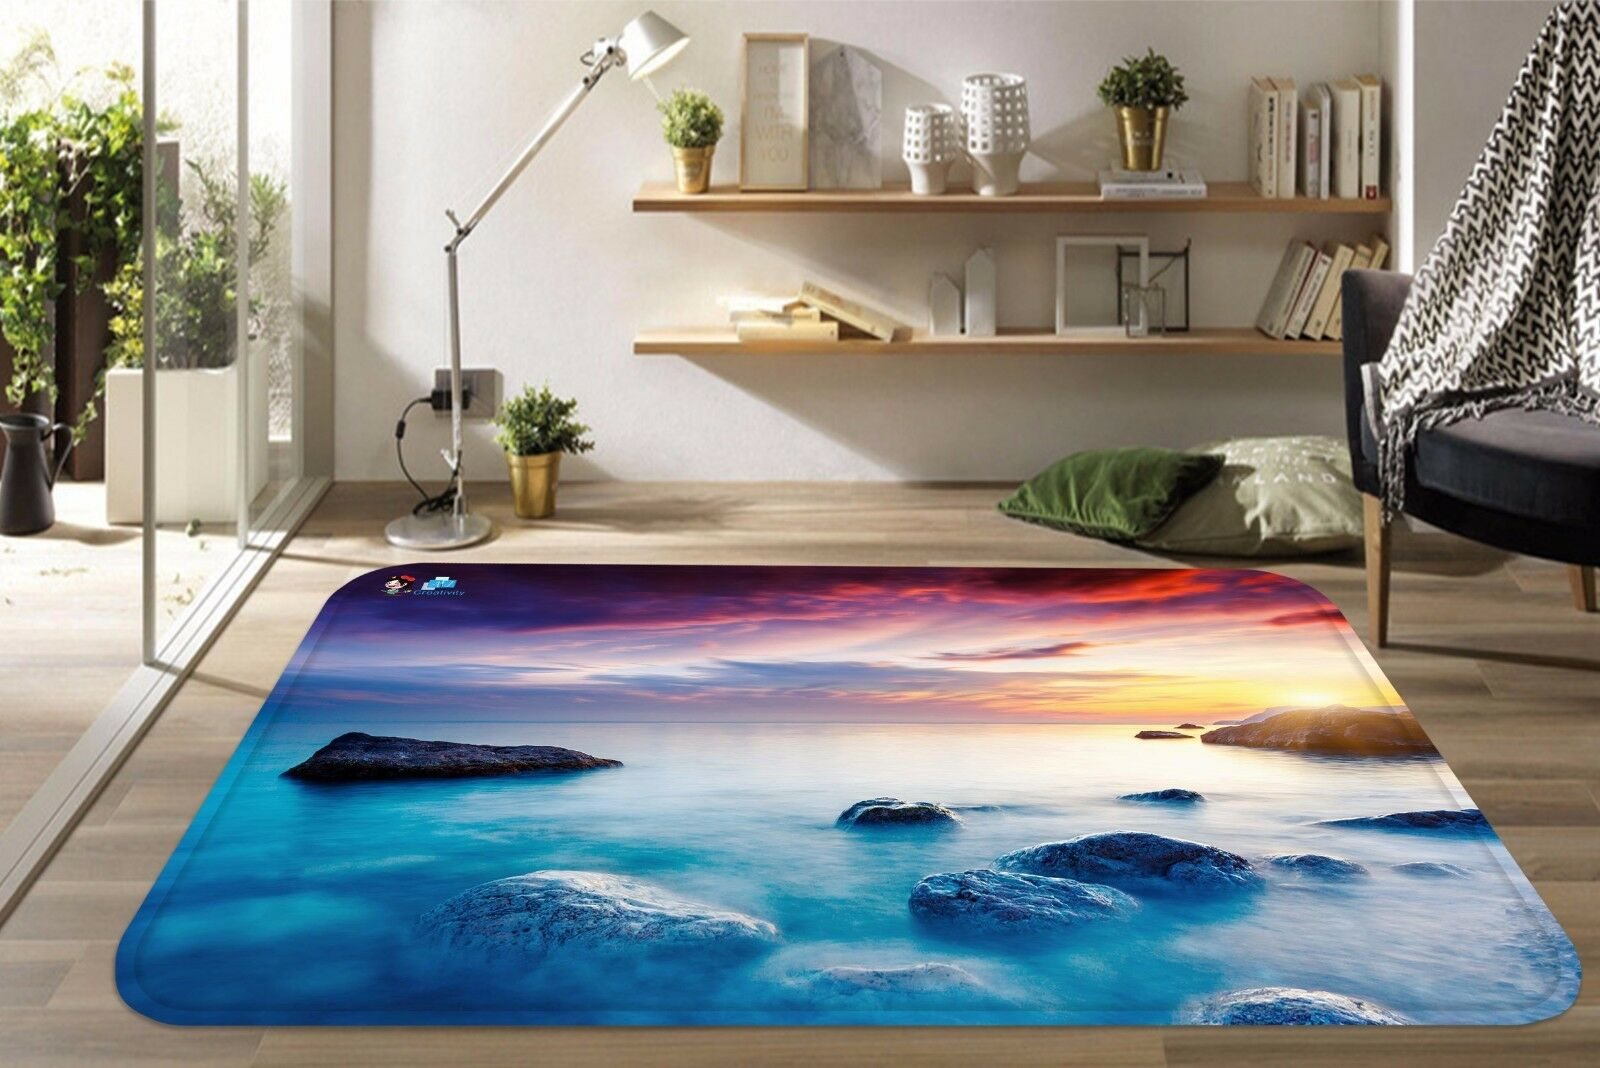 3D STONE River 46 tappetino antiscivolo tappeto camera Tappetino Qualità Elegante foto Tappeto UK